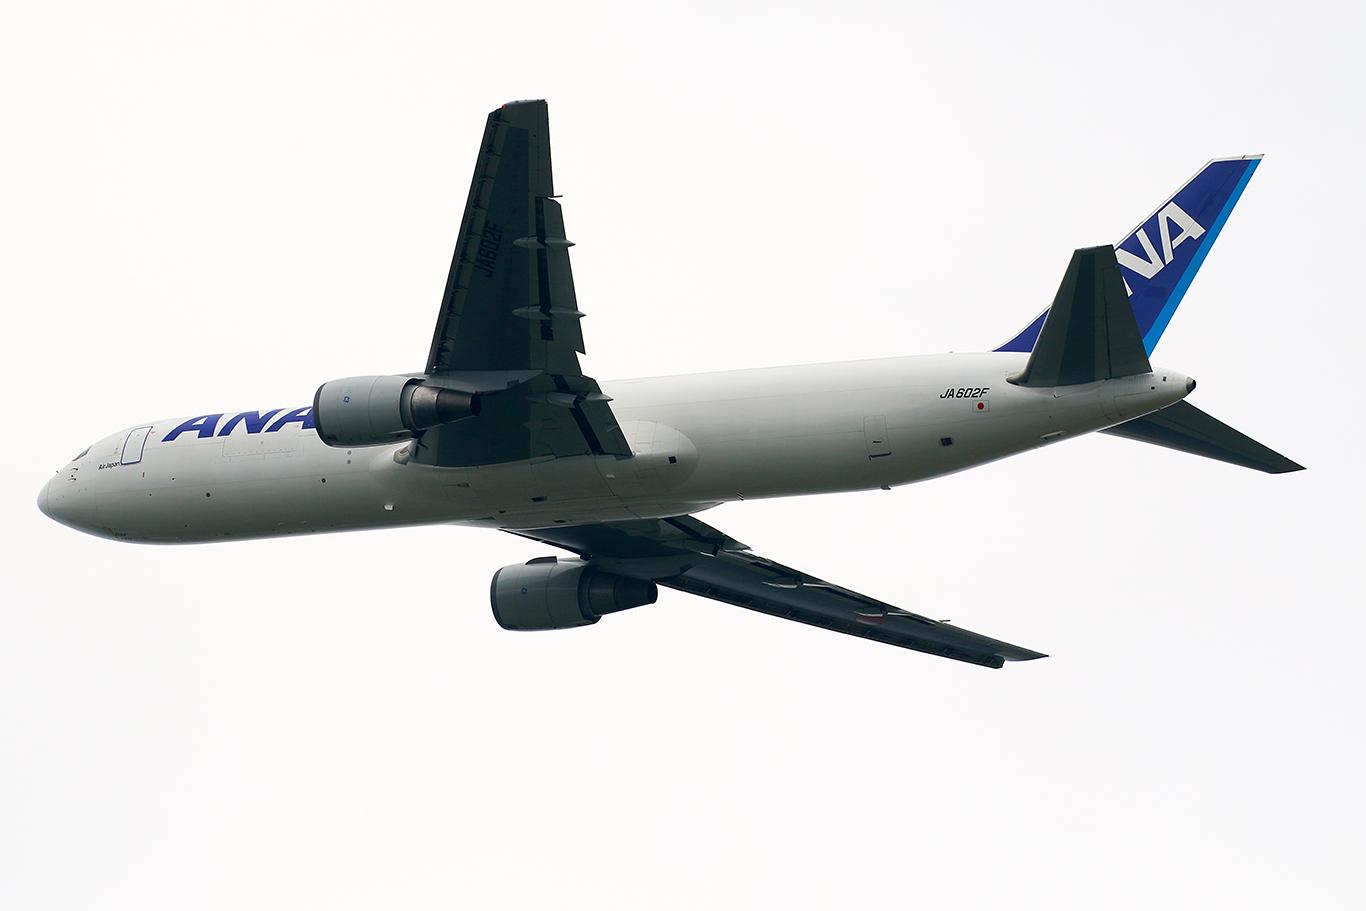 NH/ANA/全日空 NH8539 B767-300ERF JA602F